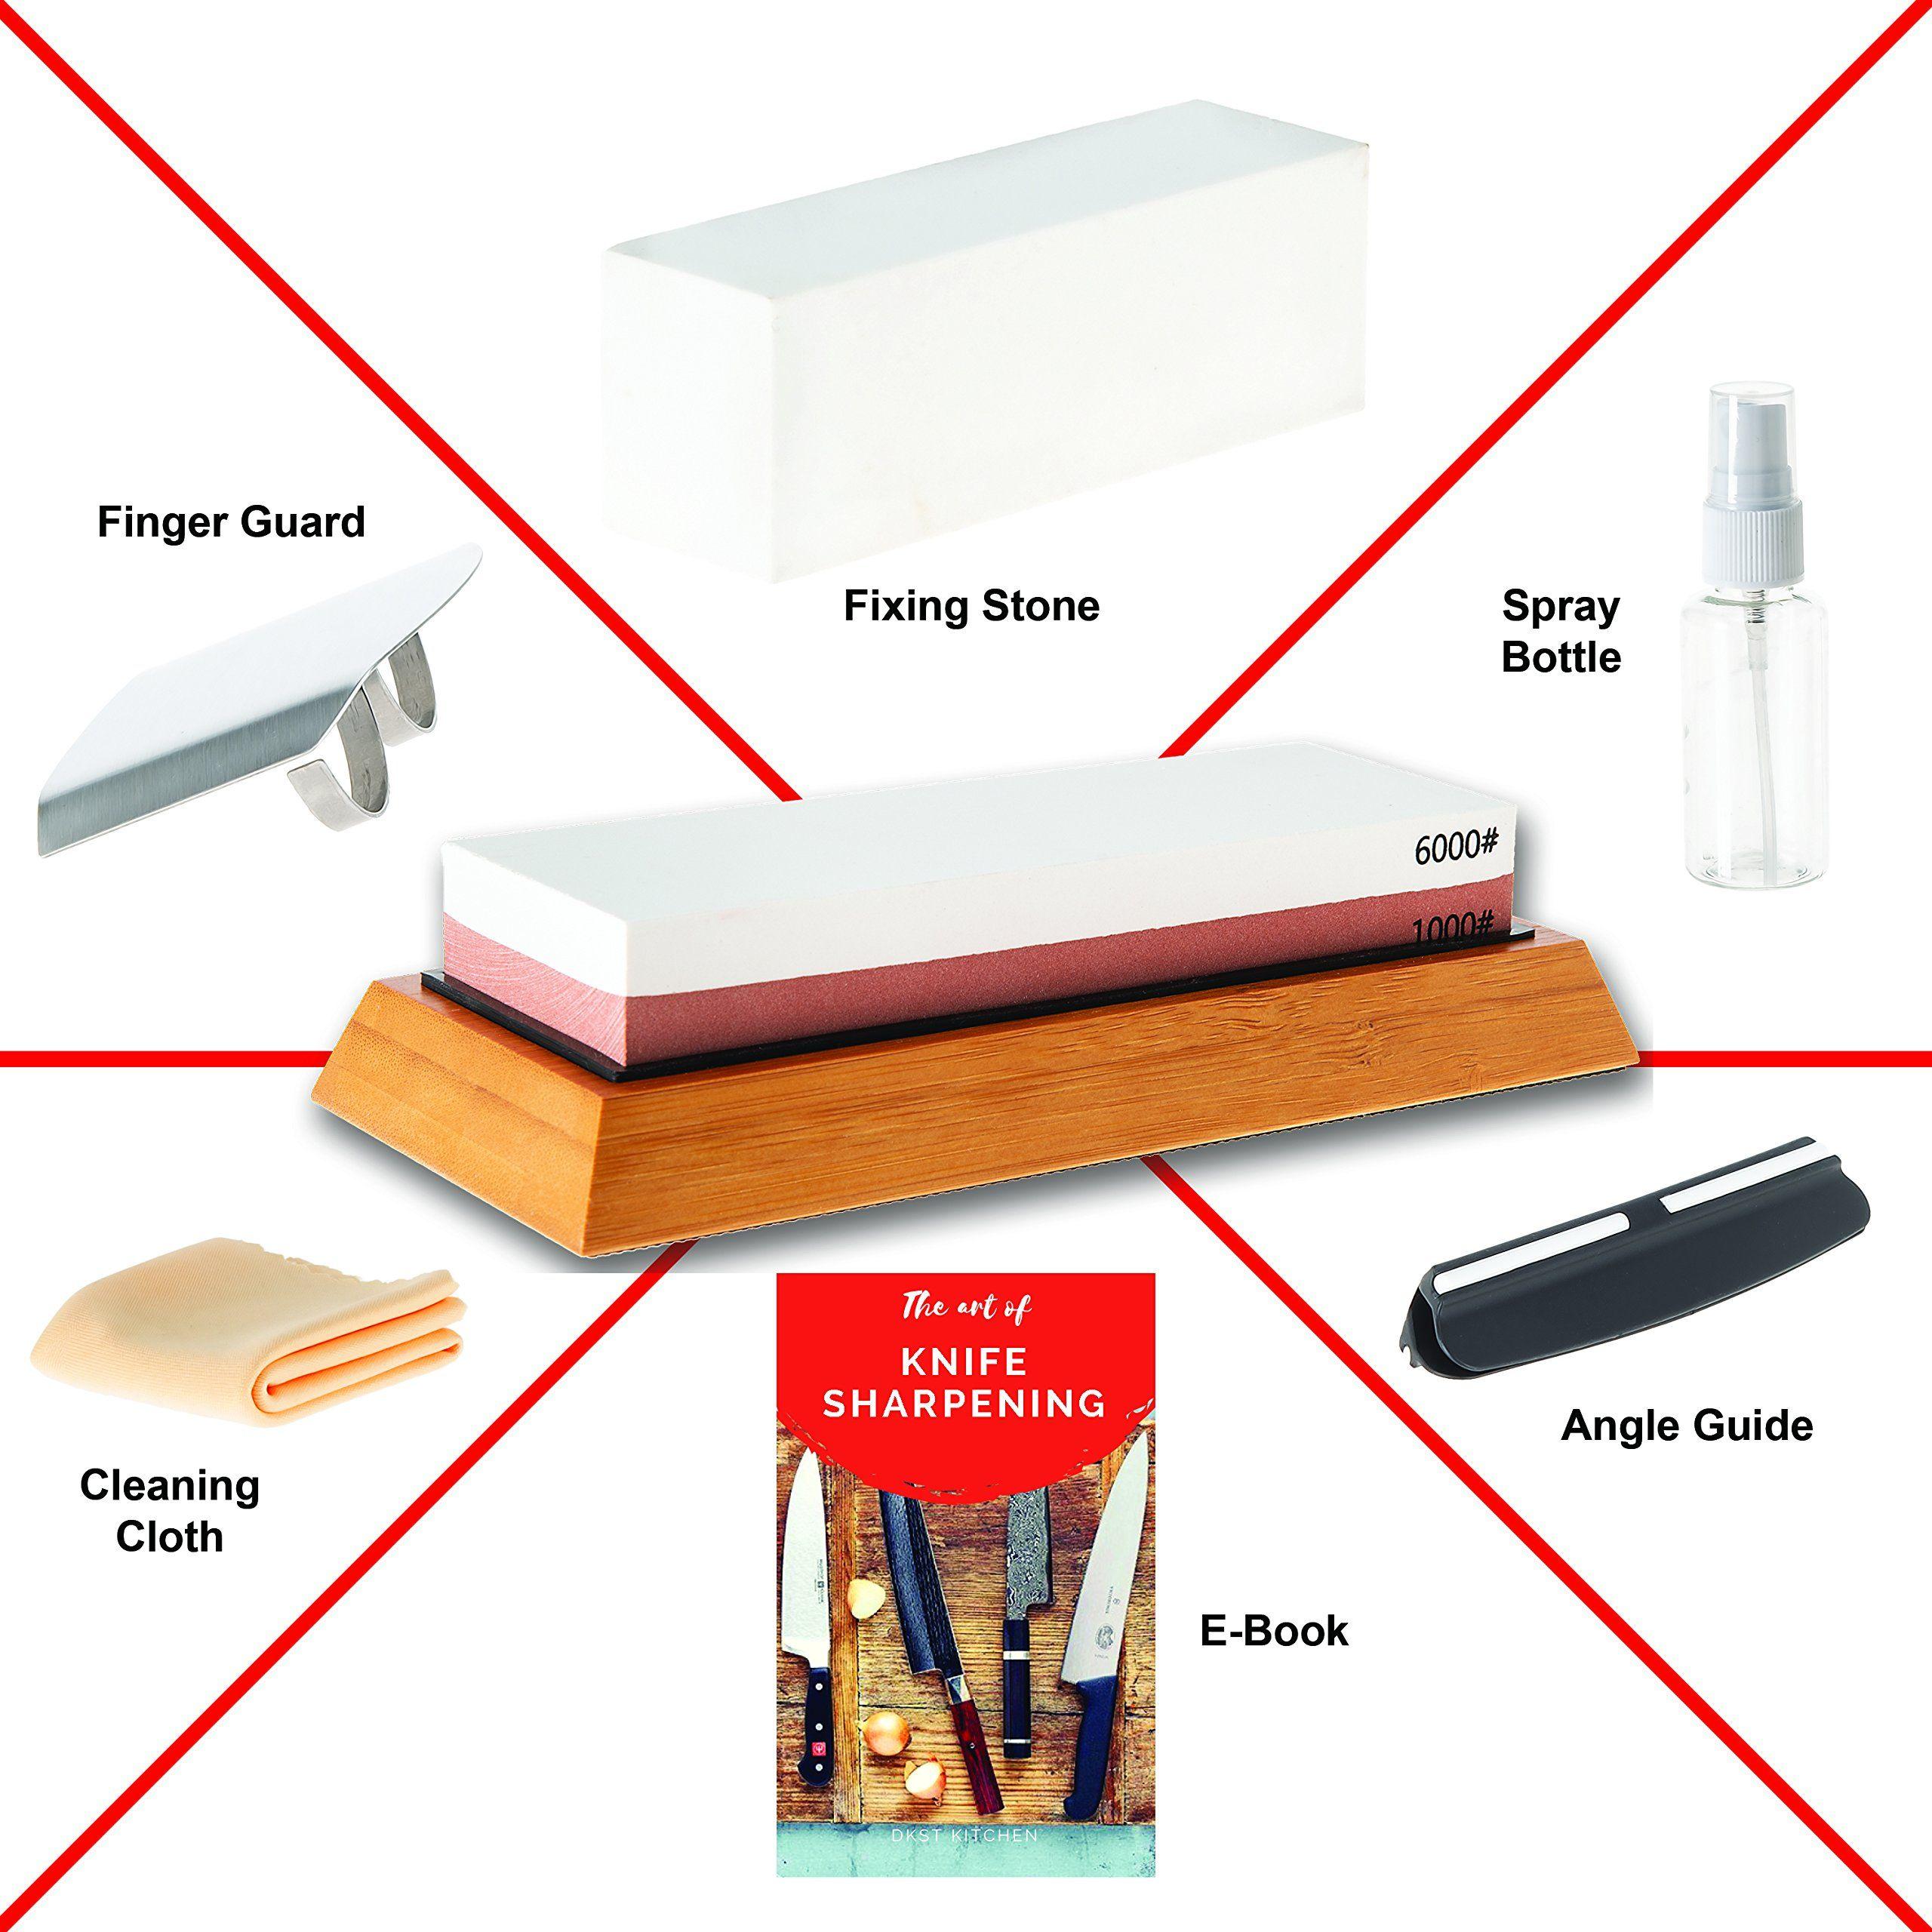 Dkstkitchen Knife Sharpening Stone Set Japanese Wet Stones Includes Angle Guide Fixer Antislip Bamboo In 2020 Knife Sharpening Stone Knife Sharpening Sharpening Stone